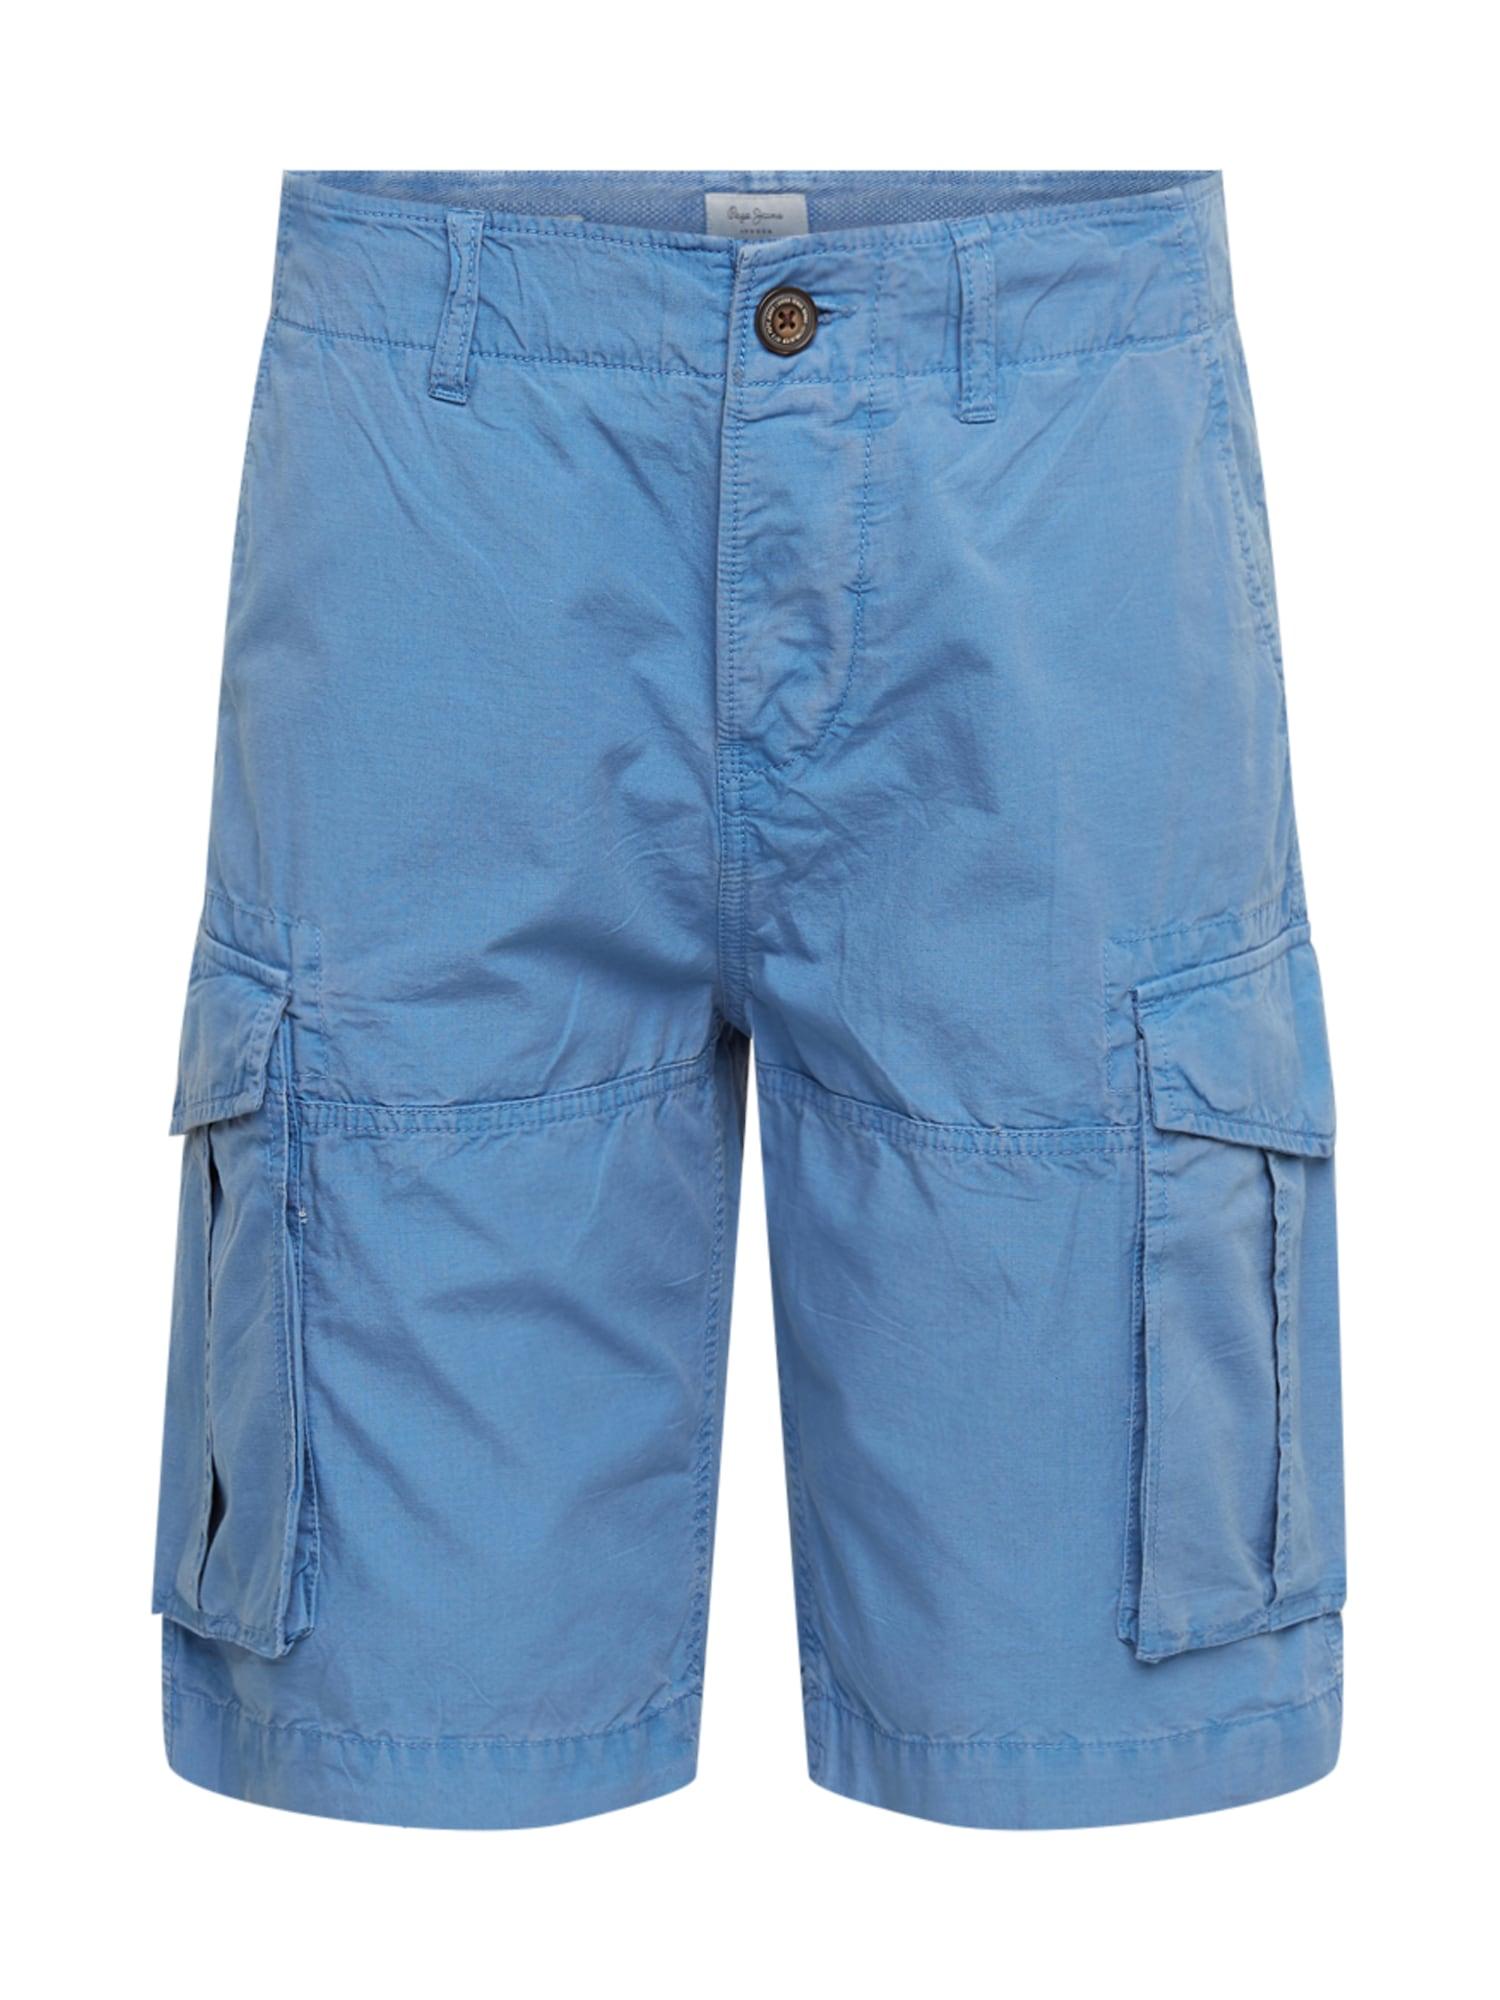 "Pepe Jeans Laisvo stiliaus kelnės 'JOURNEY' sodri mėlyna (""karališka"")"